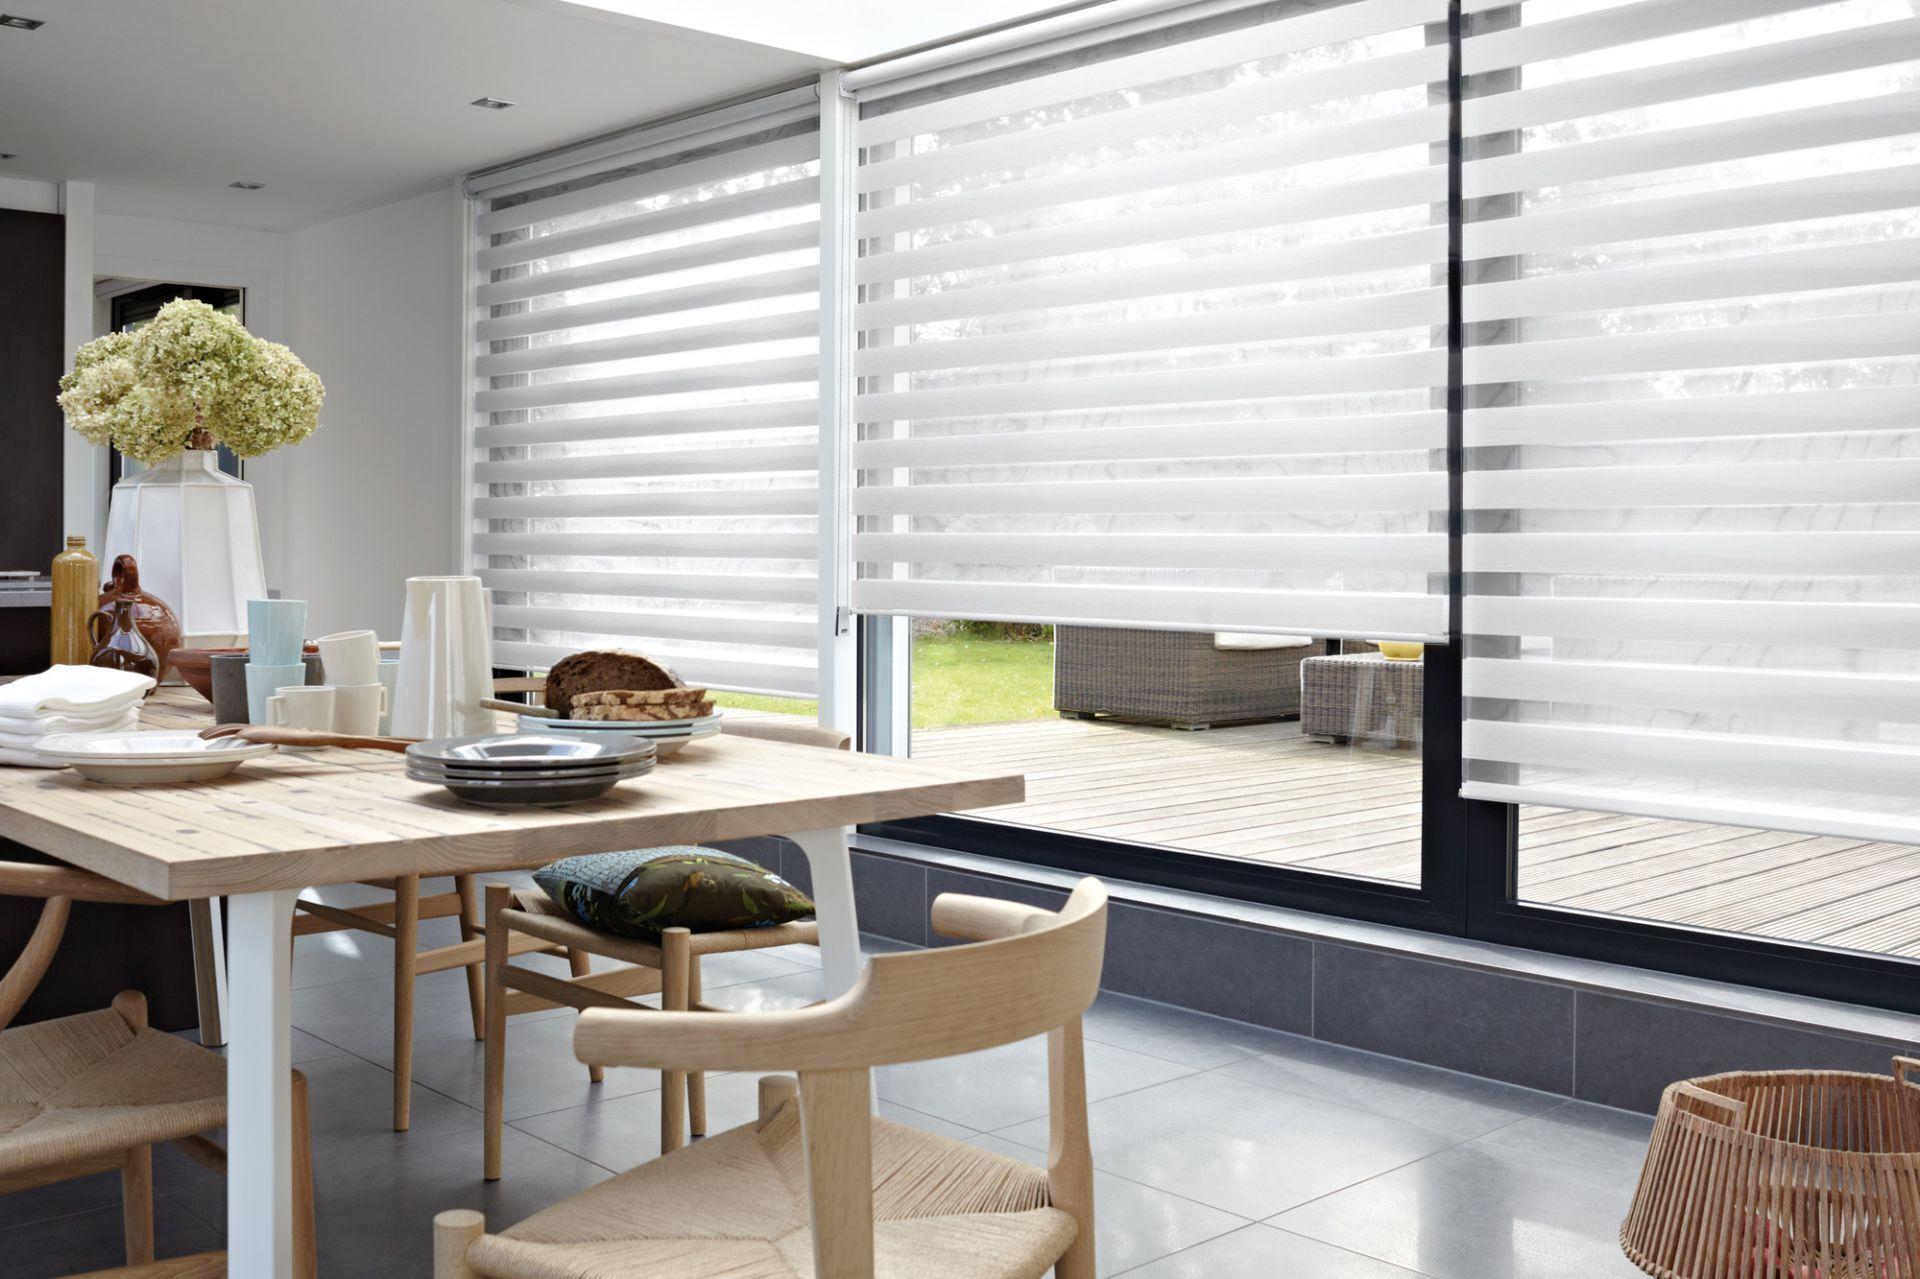 Zebra window coverings  shutter blinds bathroom blinds curtain beautifulshutter blinds